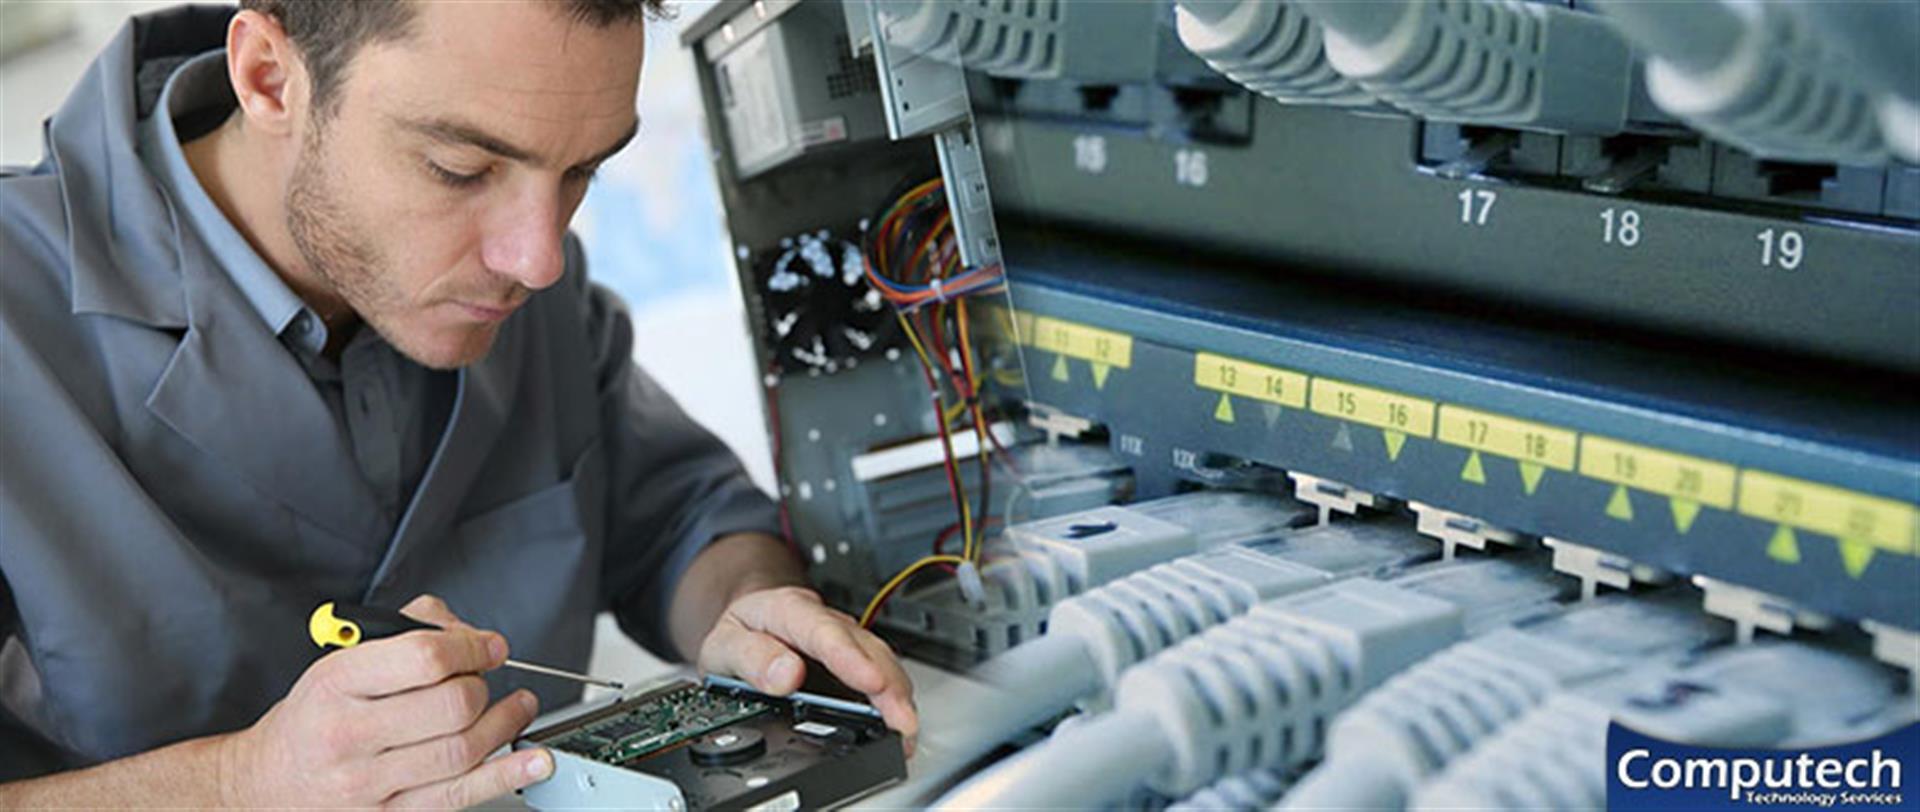 Attalla Alabama Onsite Computer & Printer Repair, Networks, Voice & Data Wiring Services